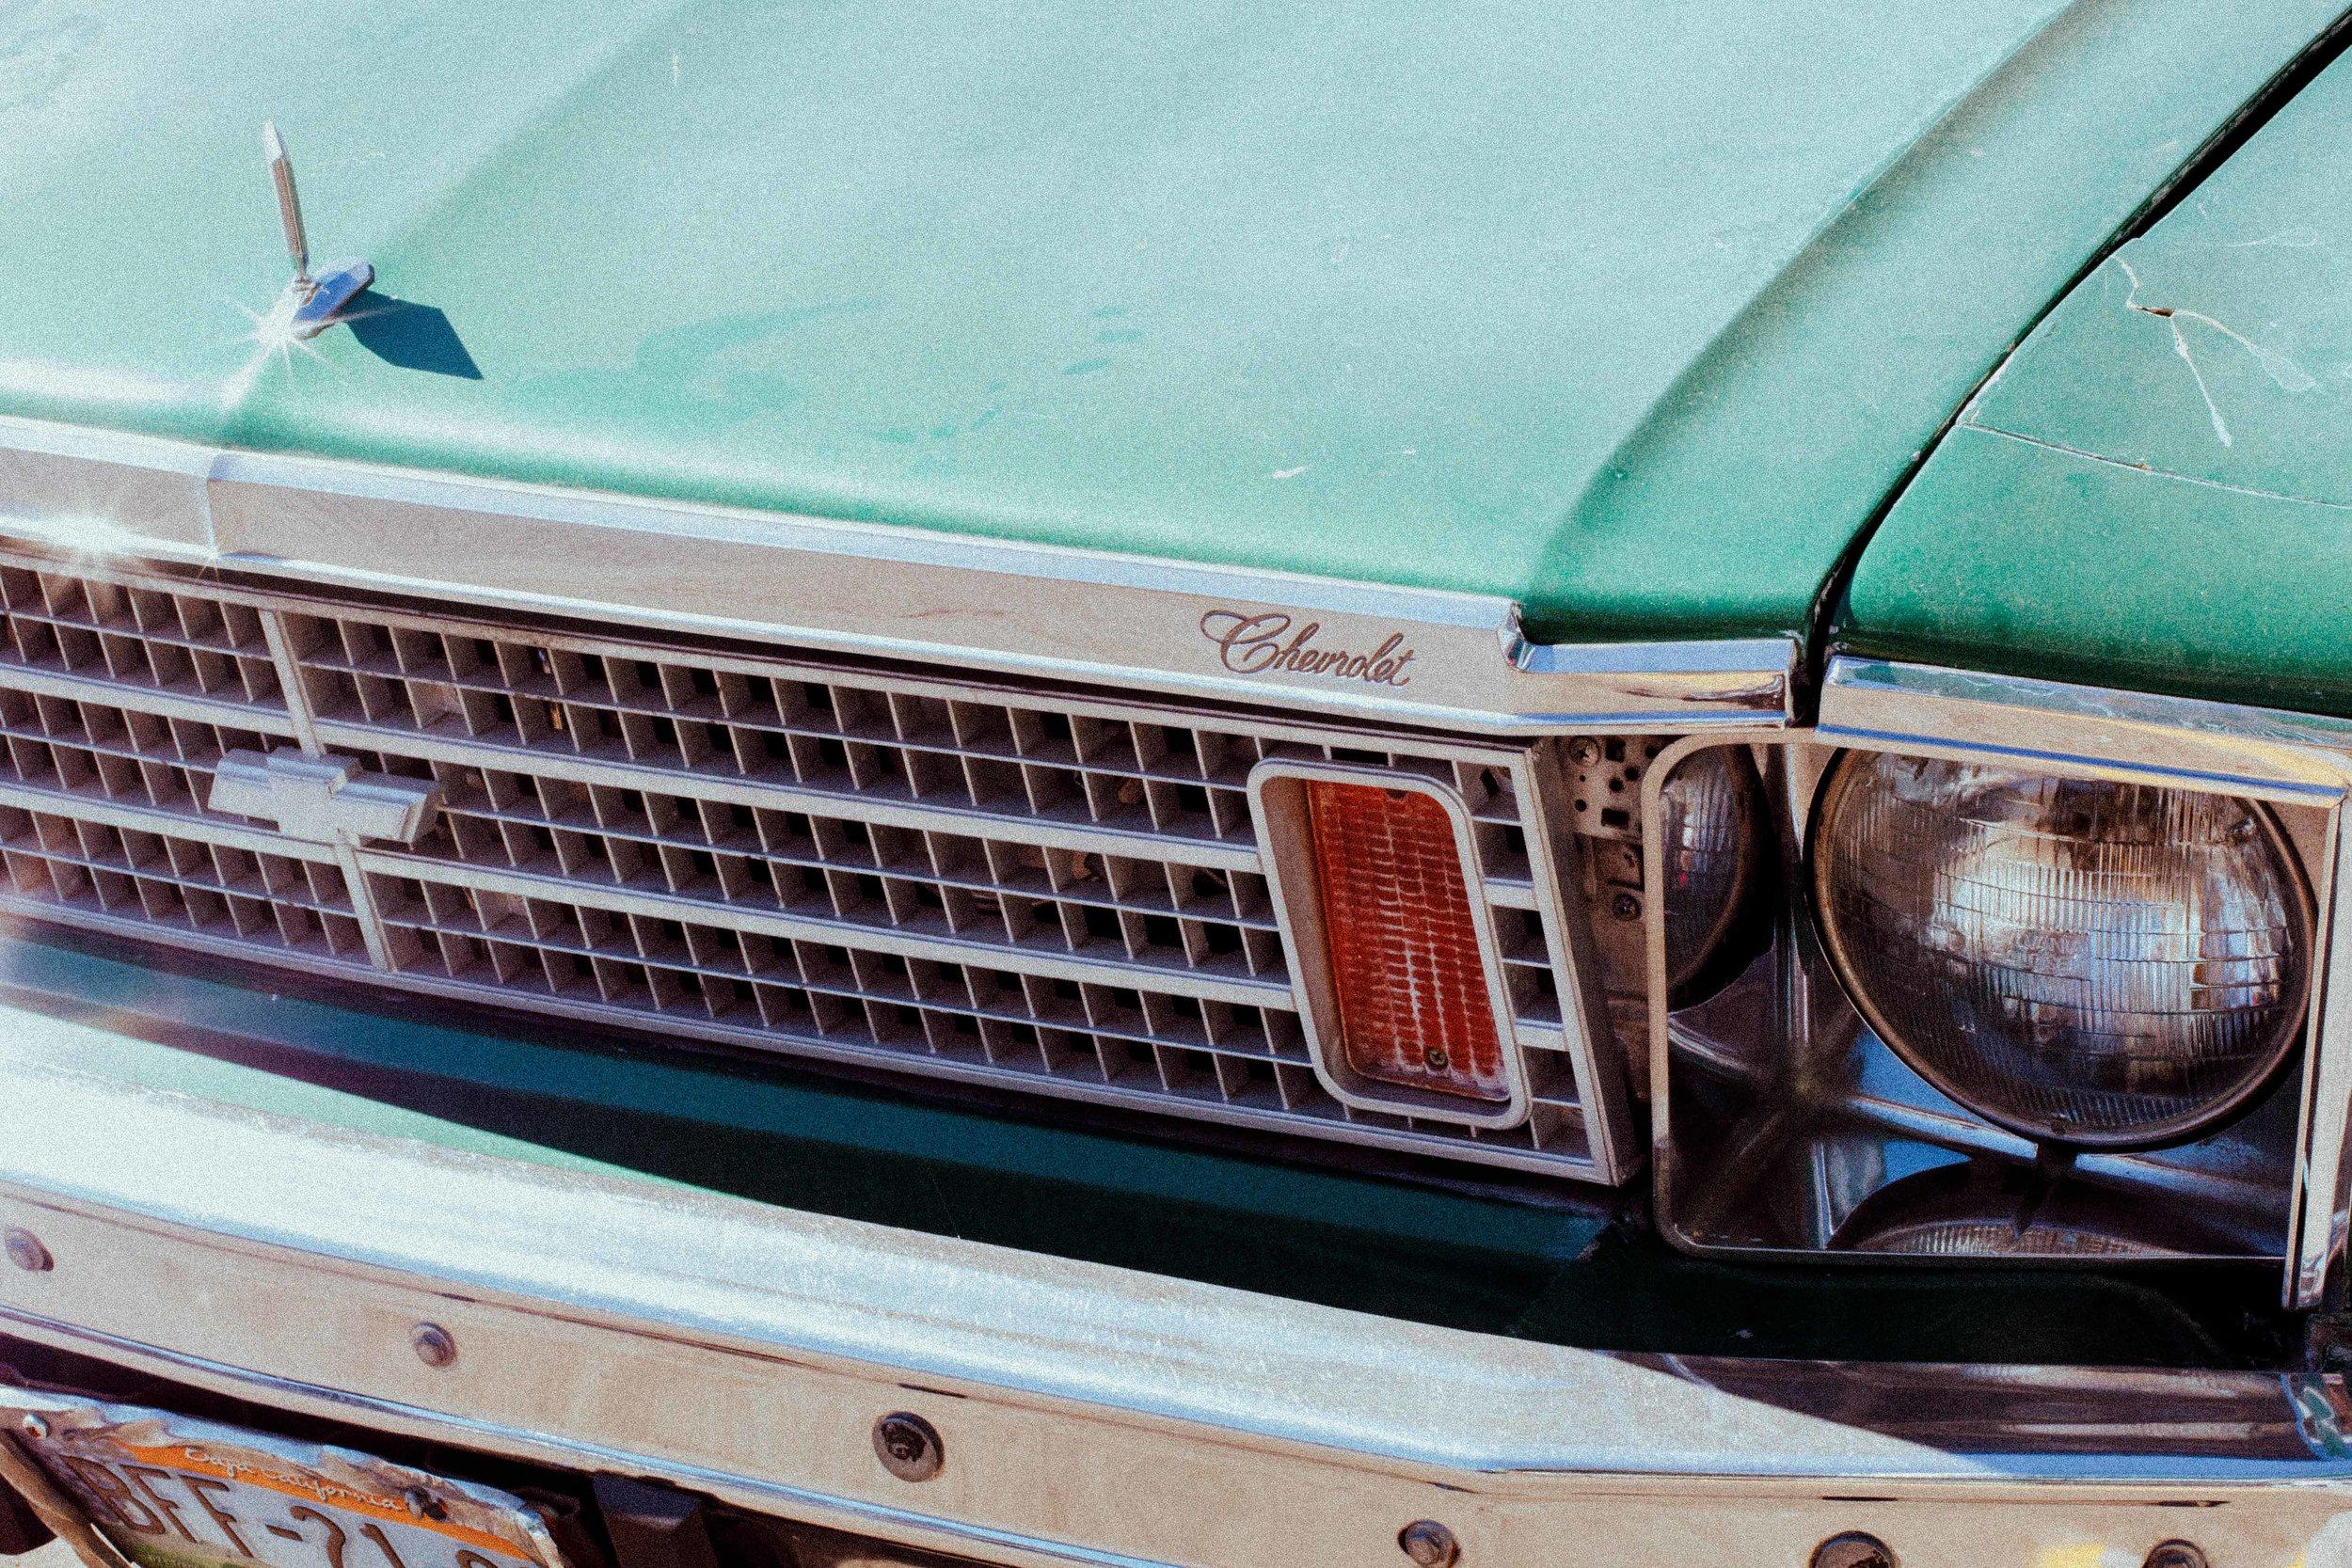 Chevy (2 of 2).jpg